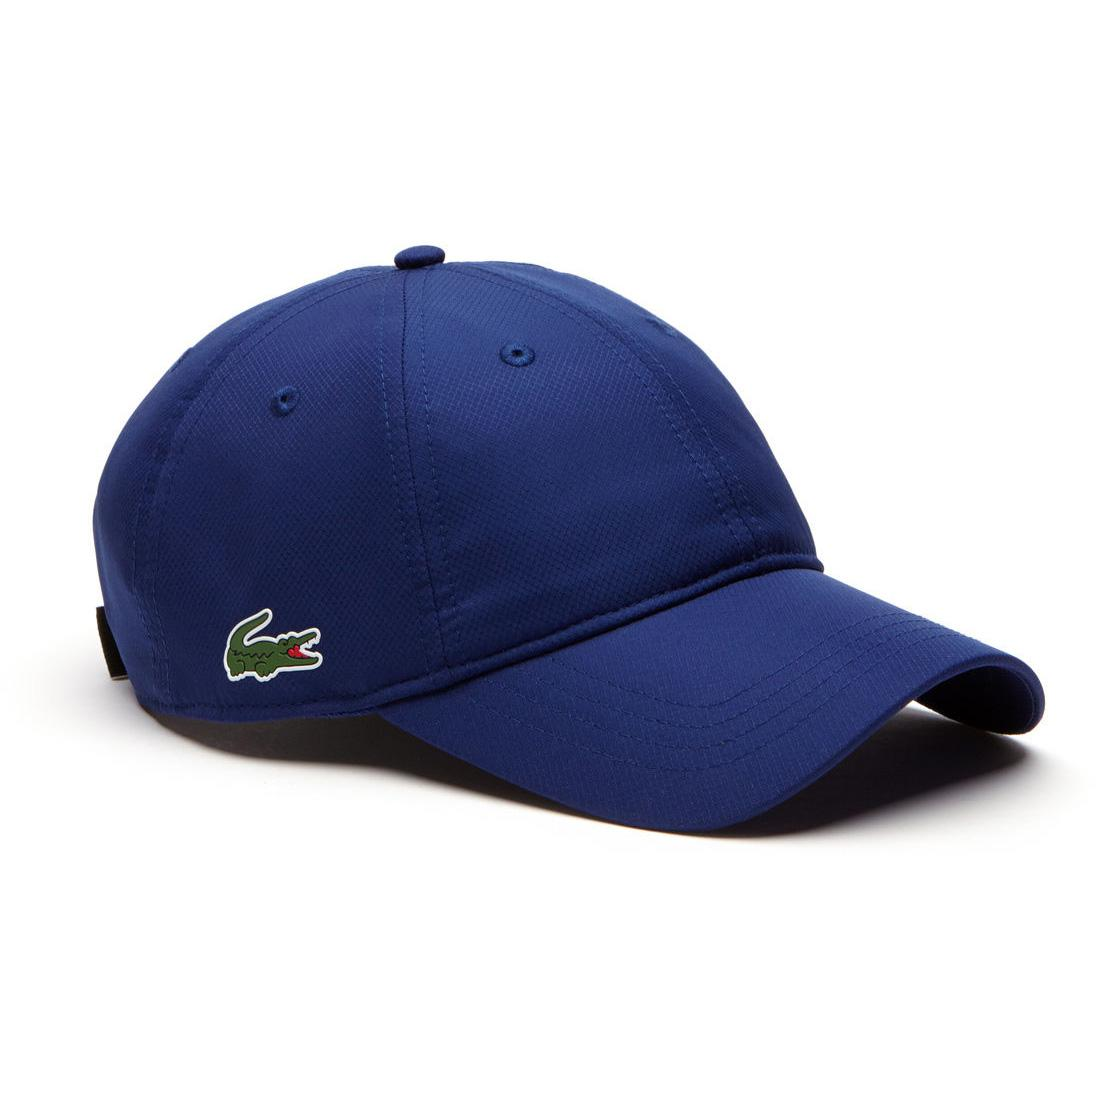 c0c6300711945 Lacoste Sport Mens Cap in Solid Diamond Weave Taffeta - Ocean Blue -  Tennisnuts.com